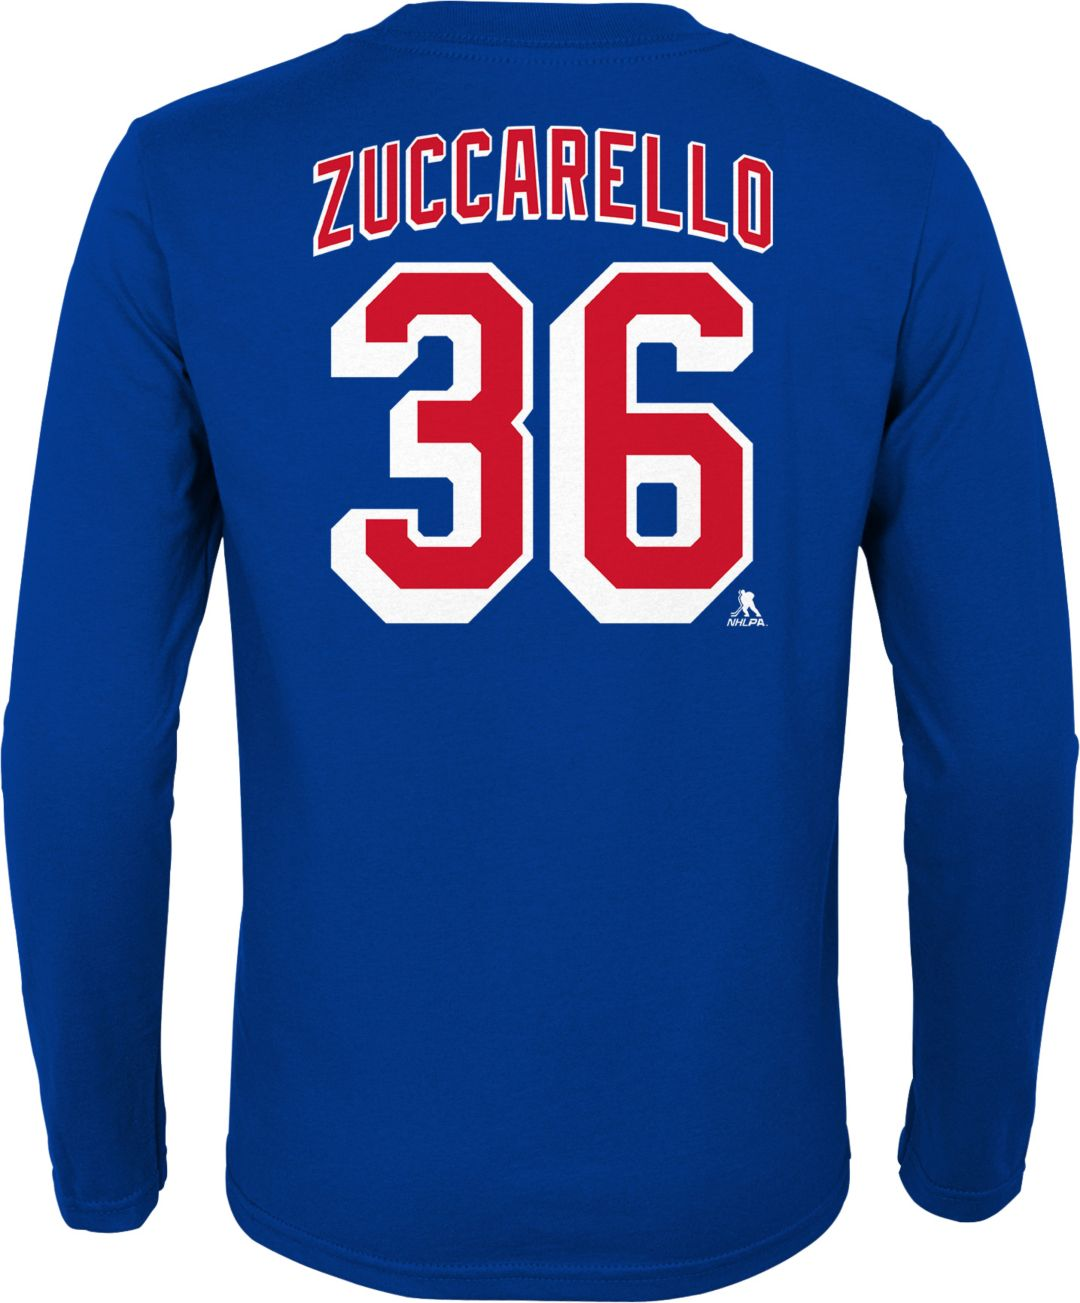 new arrival 6f5da 52a24 NHL Youth New York Rangers Mats Zuccarello #36 Royal Long Sleeve Player  Shirt